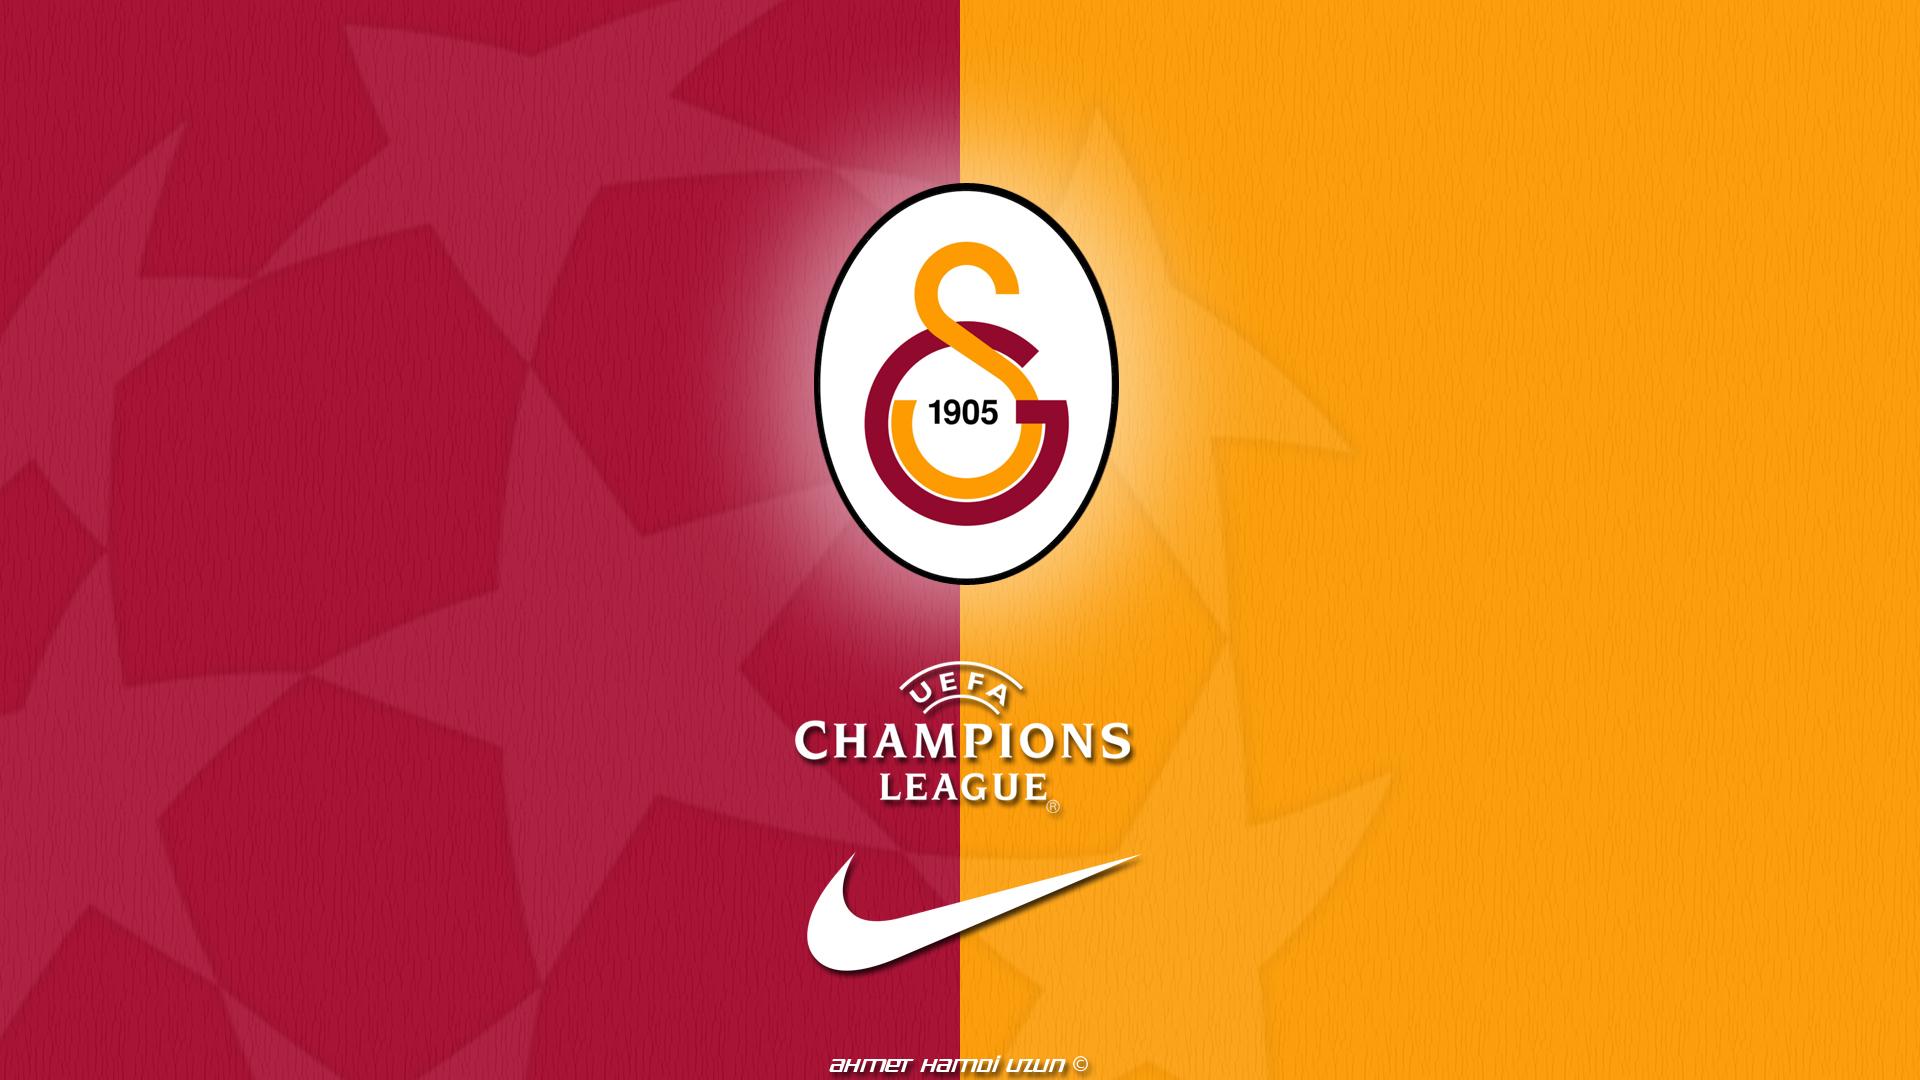 Galatasaray Wallpaper 1920x1080 1166836 Wallpaperup